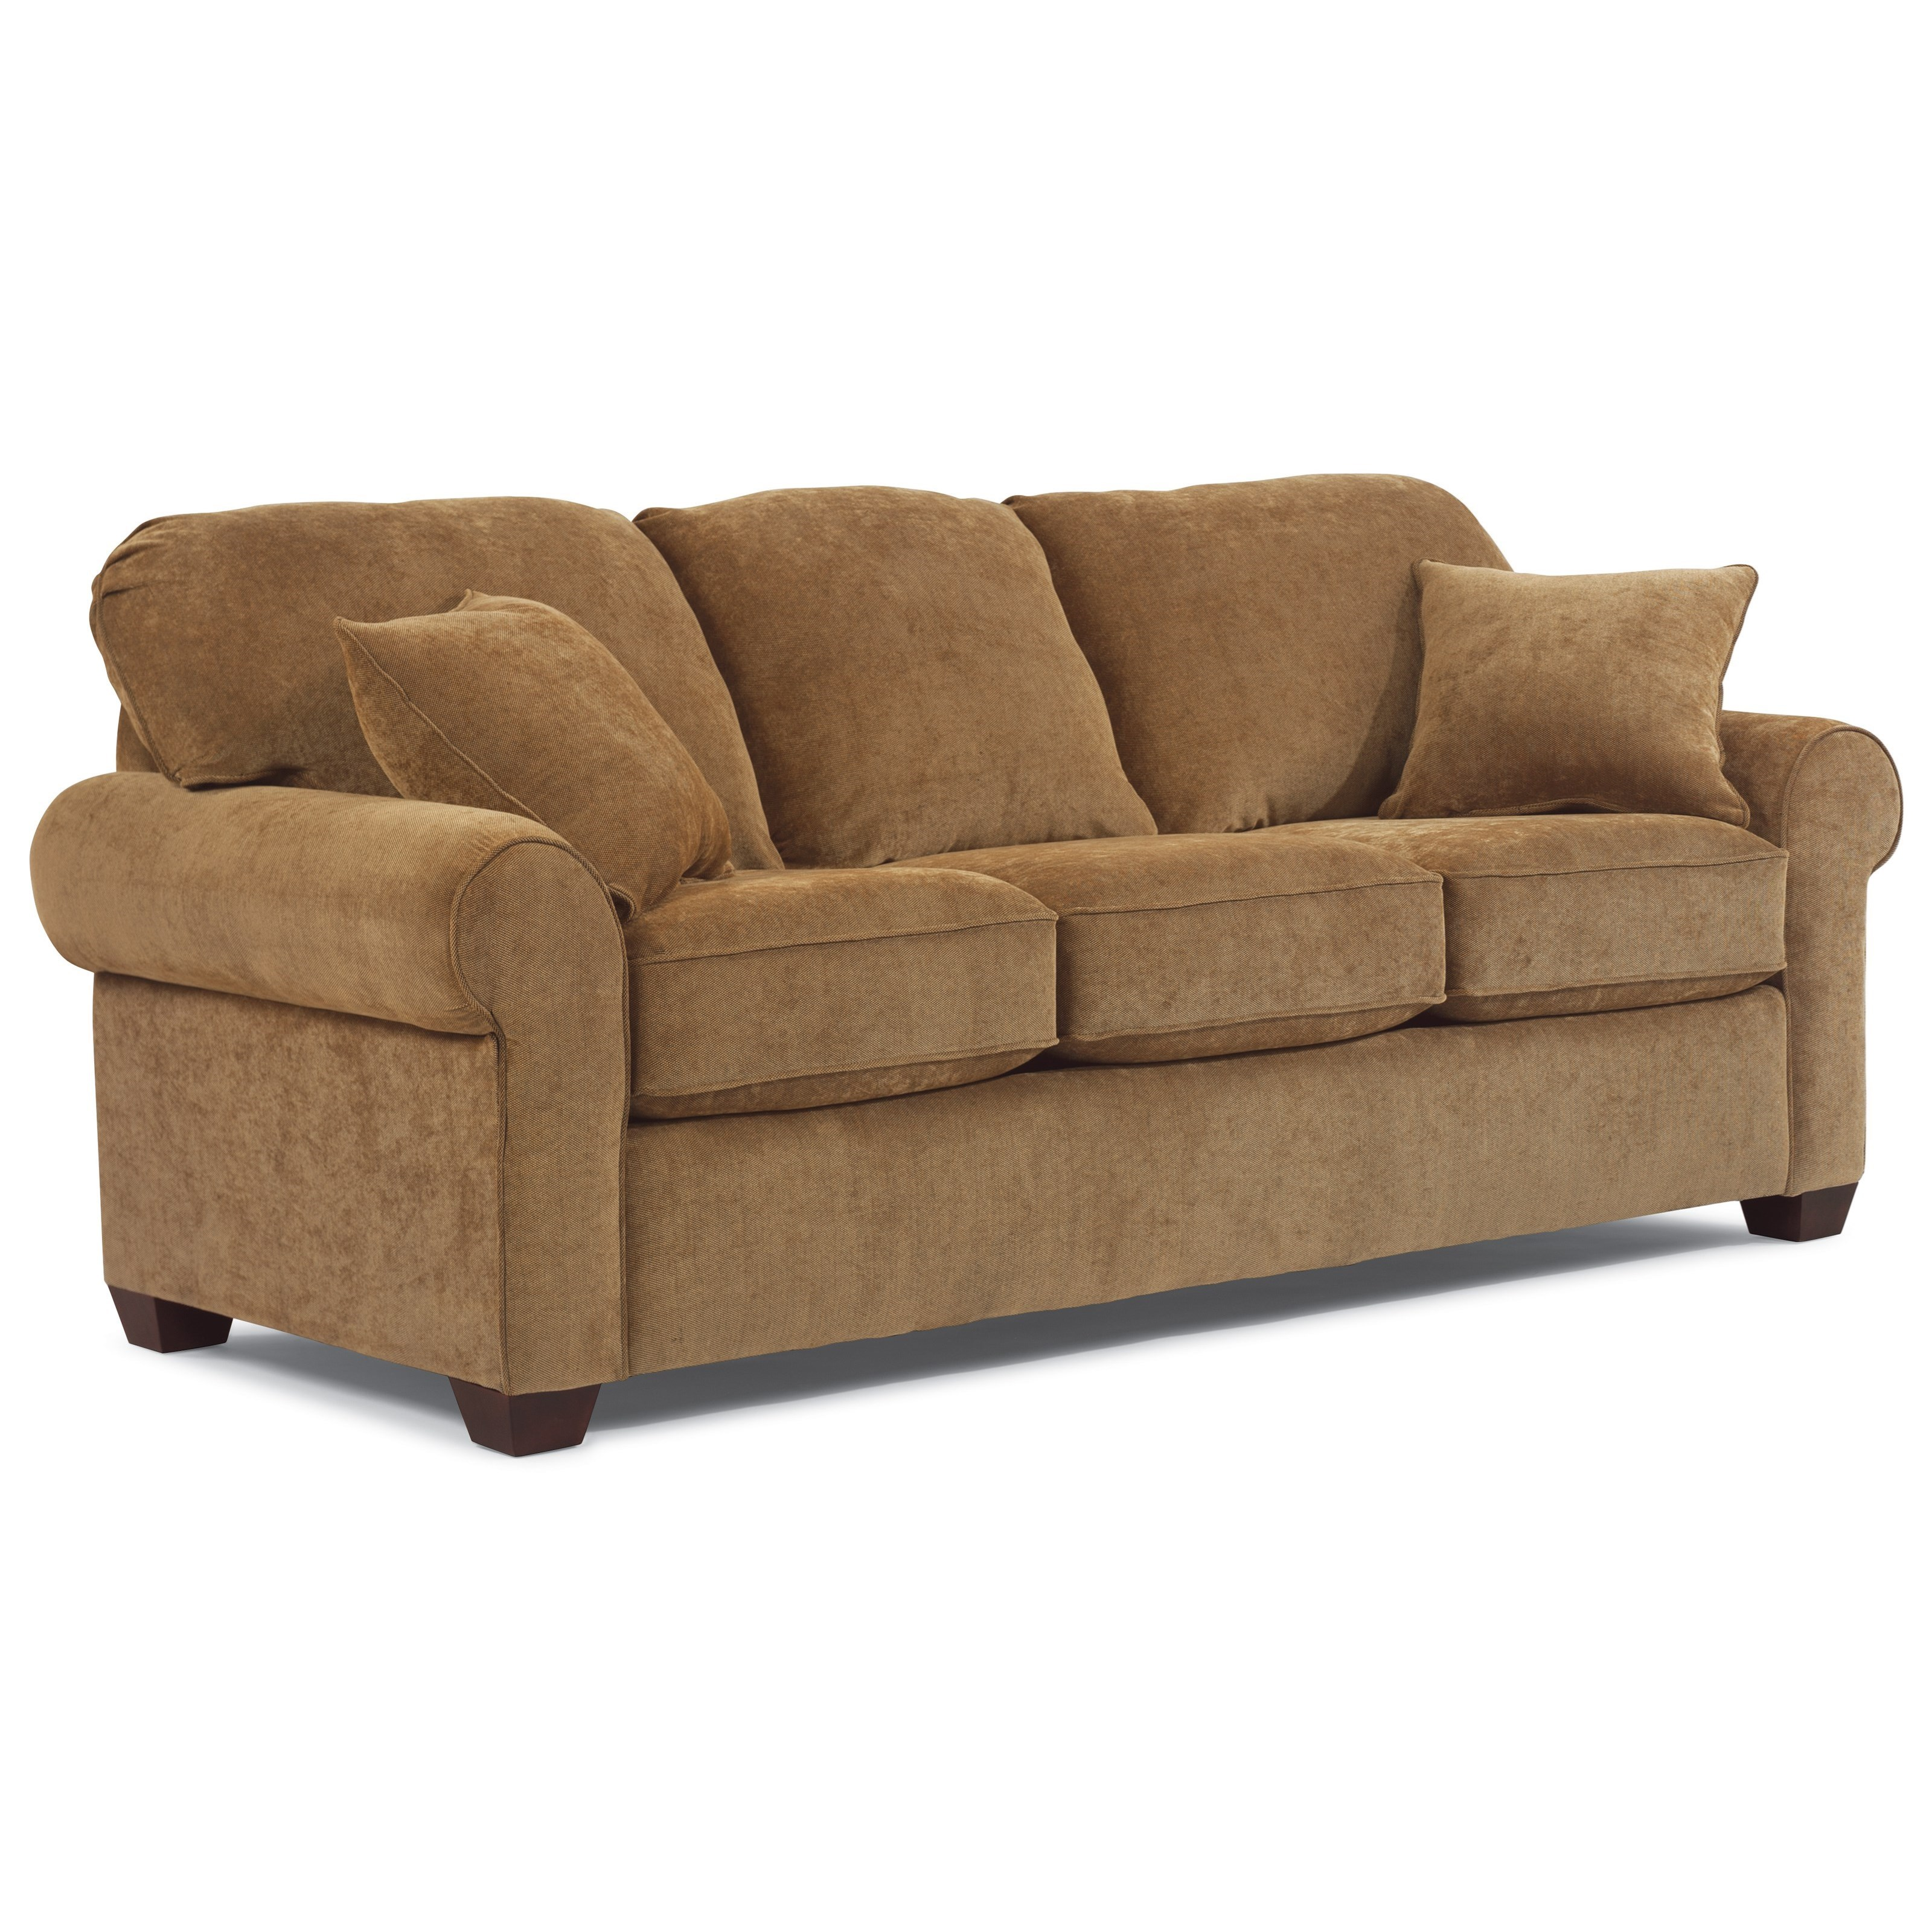 Thornton  Queen Sleeper Sofa by Flexsteel at Steger's Furniture